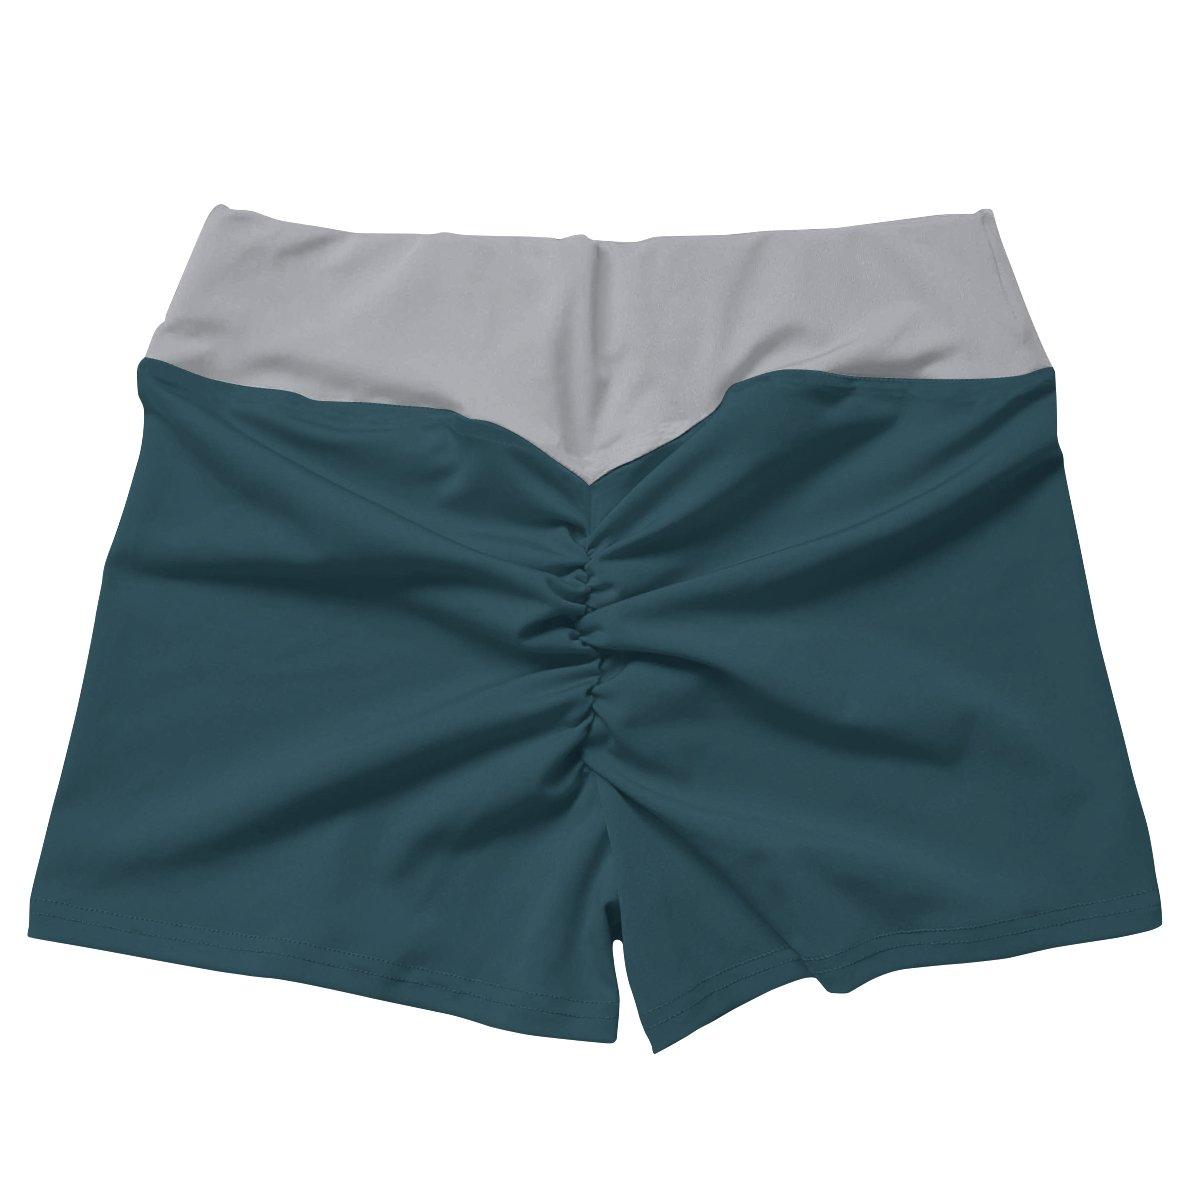 ua high uniform active wear set 777753 - Anime Swimsuits